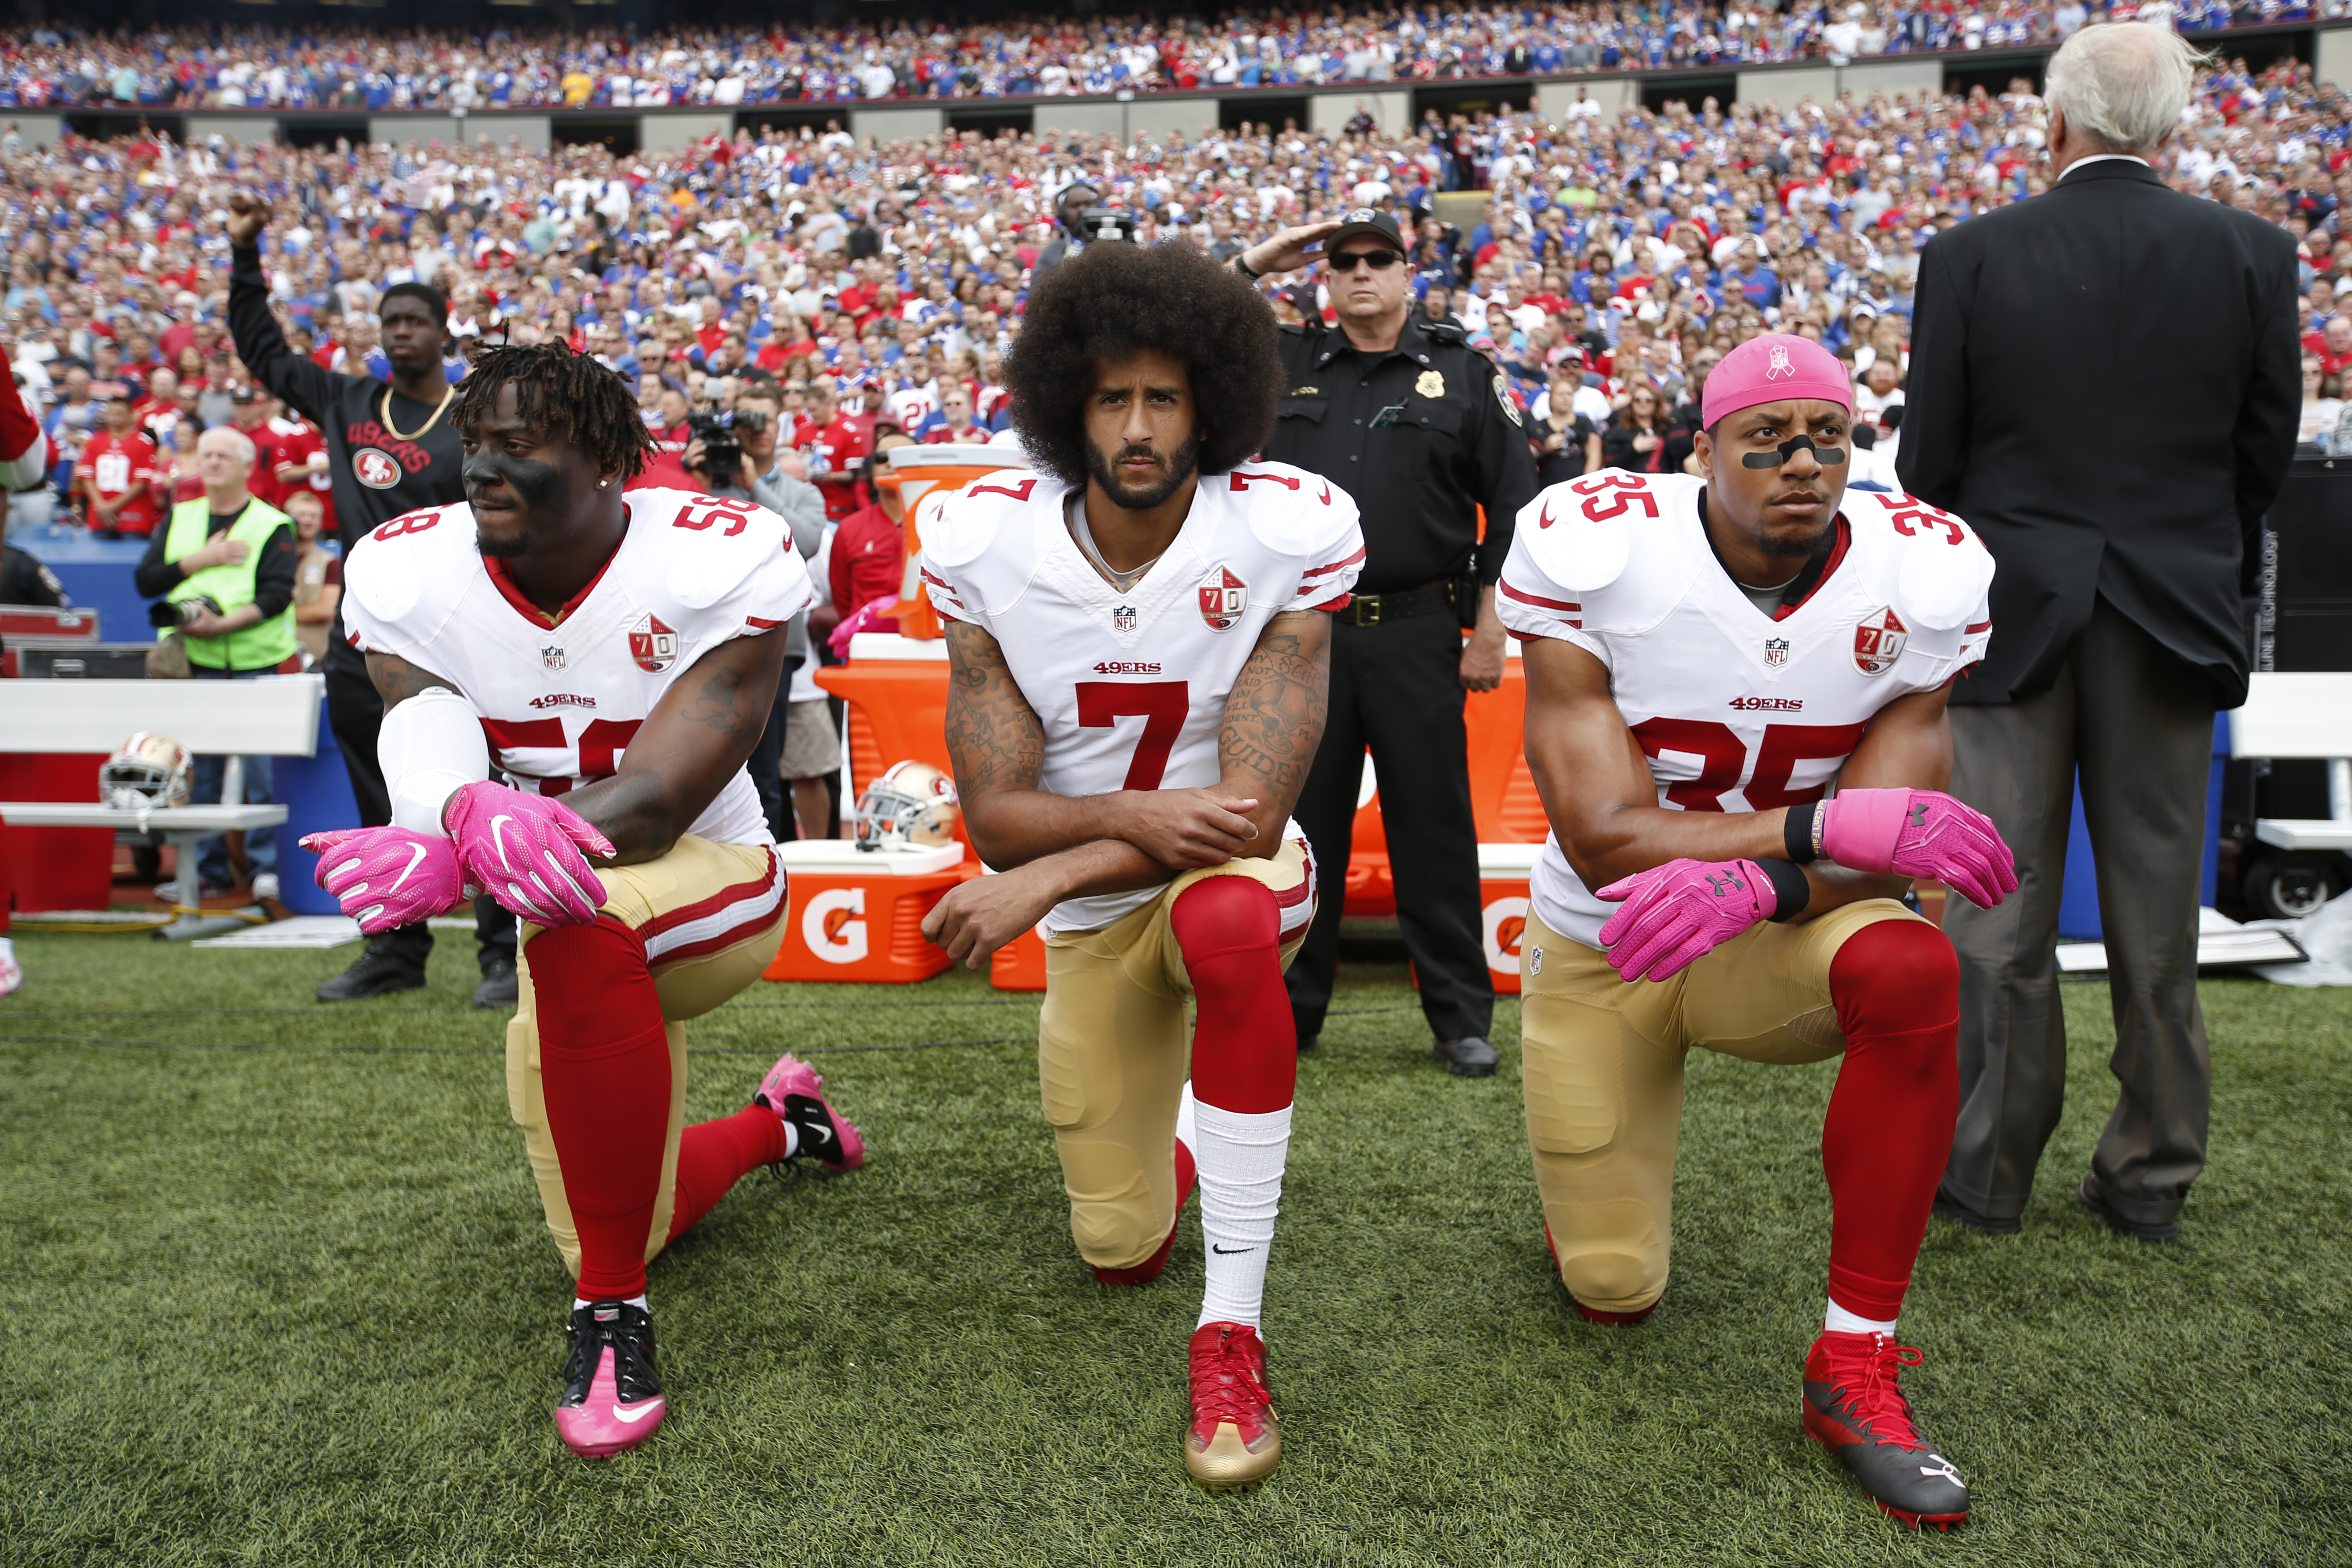 Colin Kaepernick: A travesty of justice